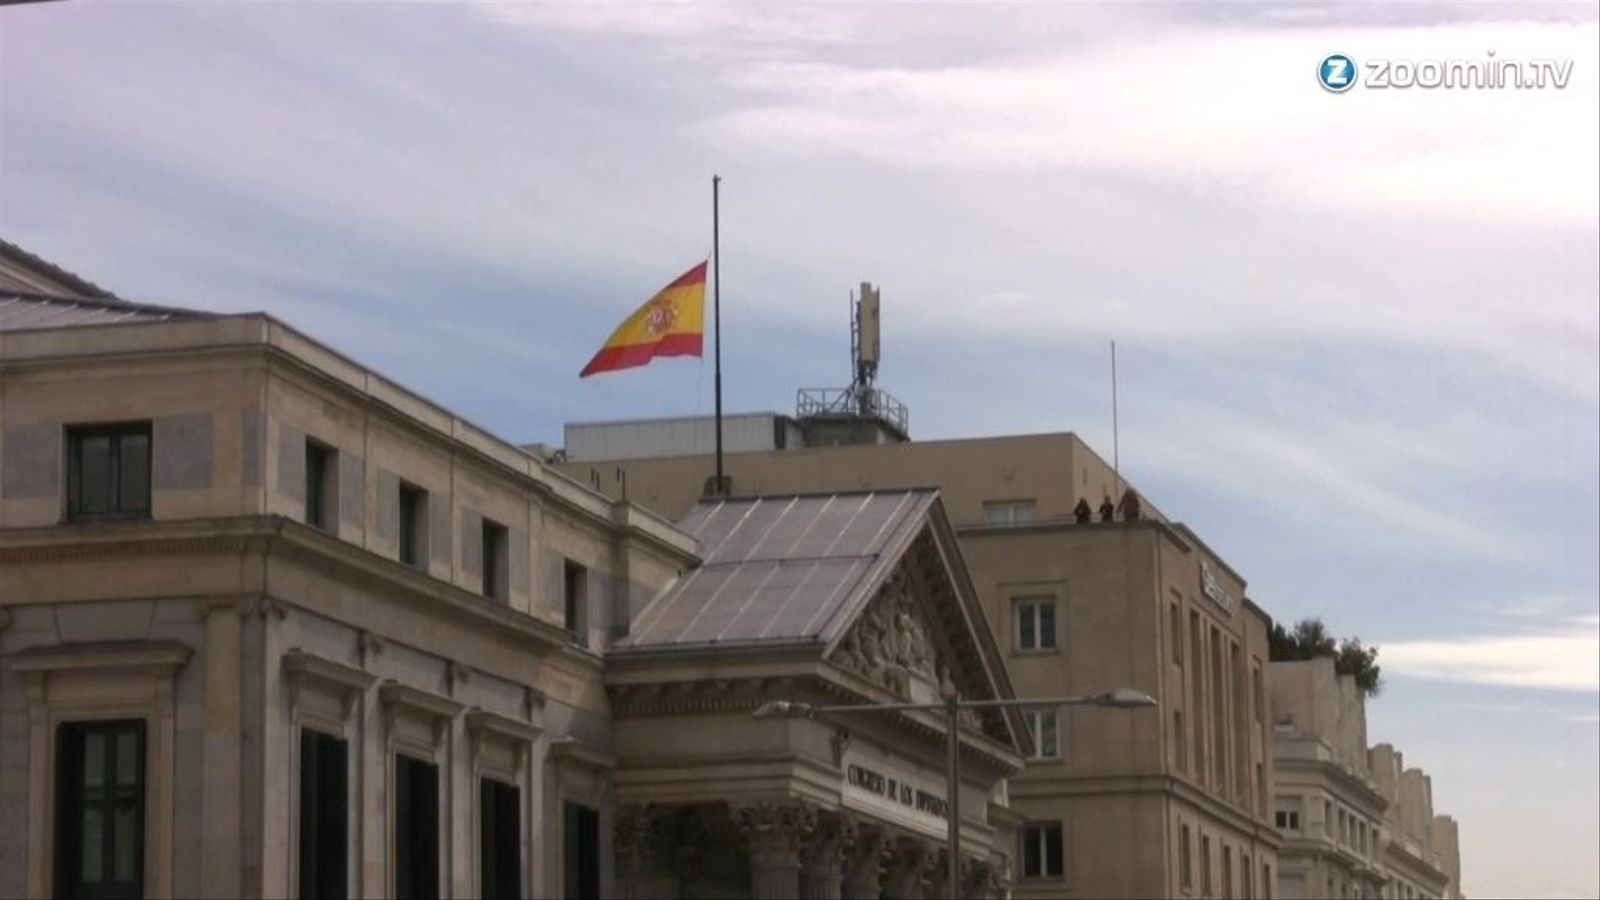 Els ciutadans s'acomiaden d'Adolfo Suárez